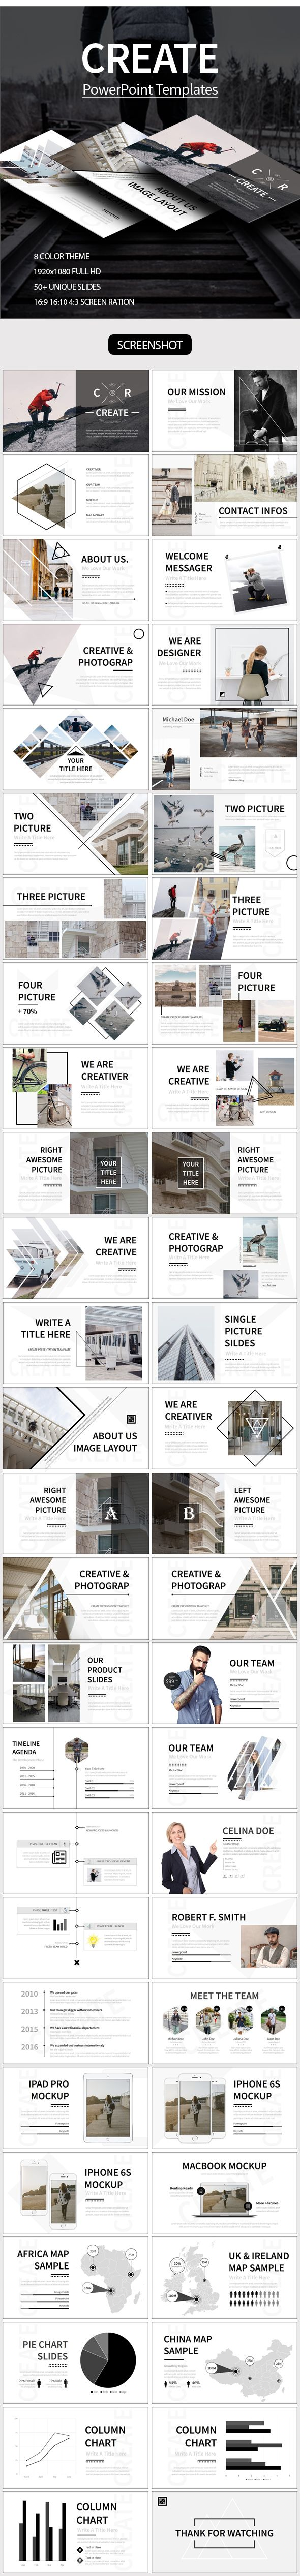 Create powerpoint template apresentao infogrficos e pranchas create powerpoint template toneelgroepblik Images